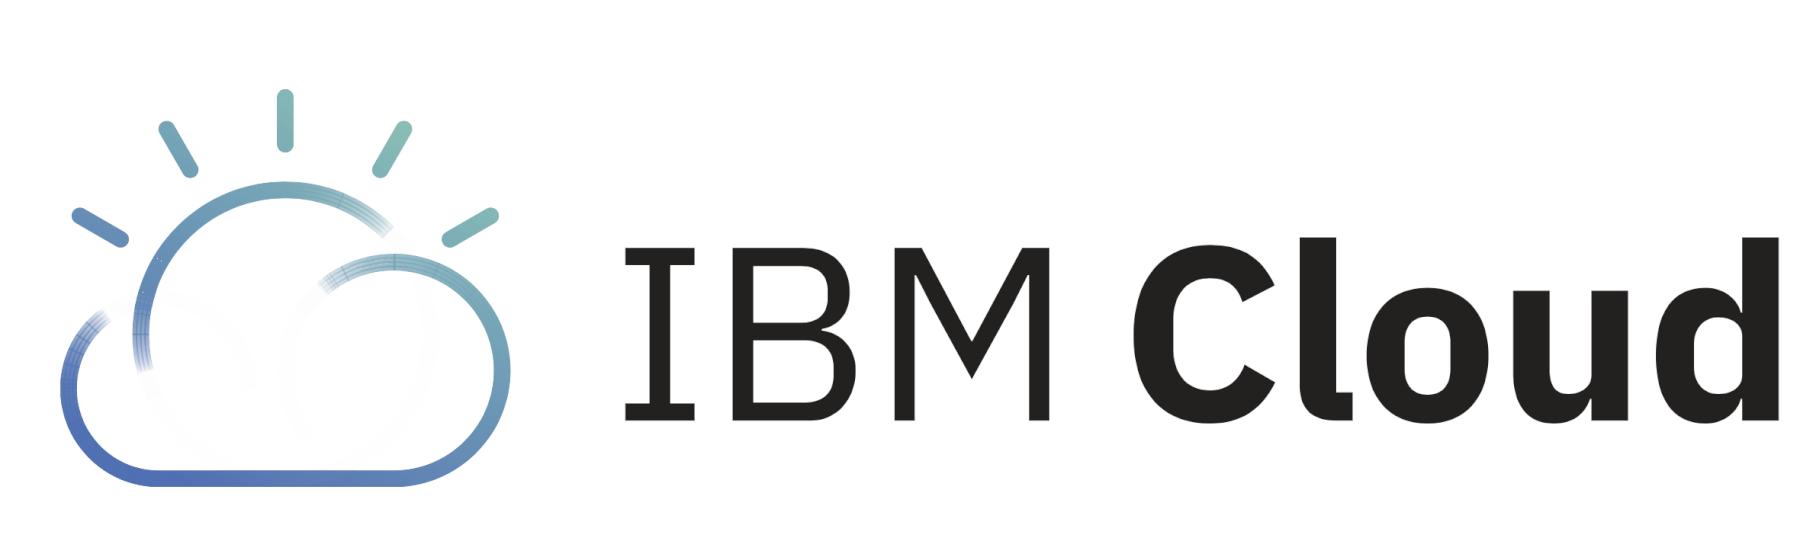 IBM cloud logo big